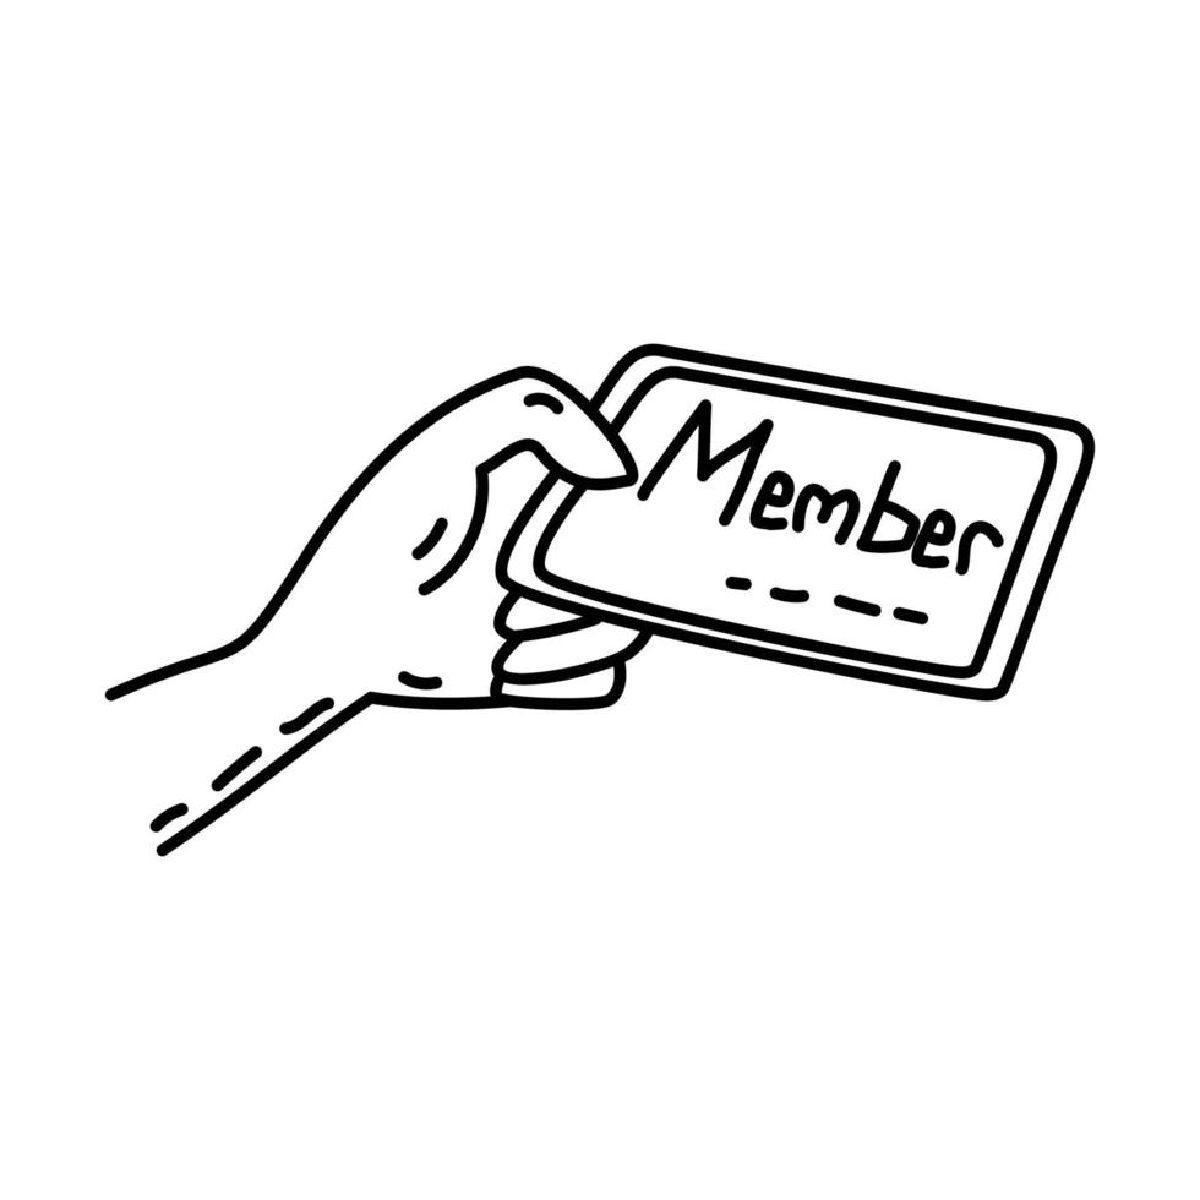 carte de membre saison 2021 - 22